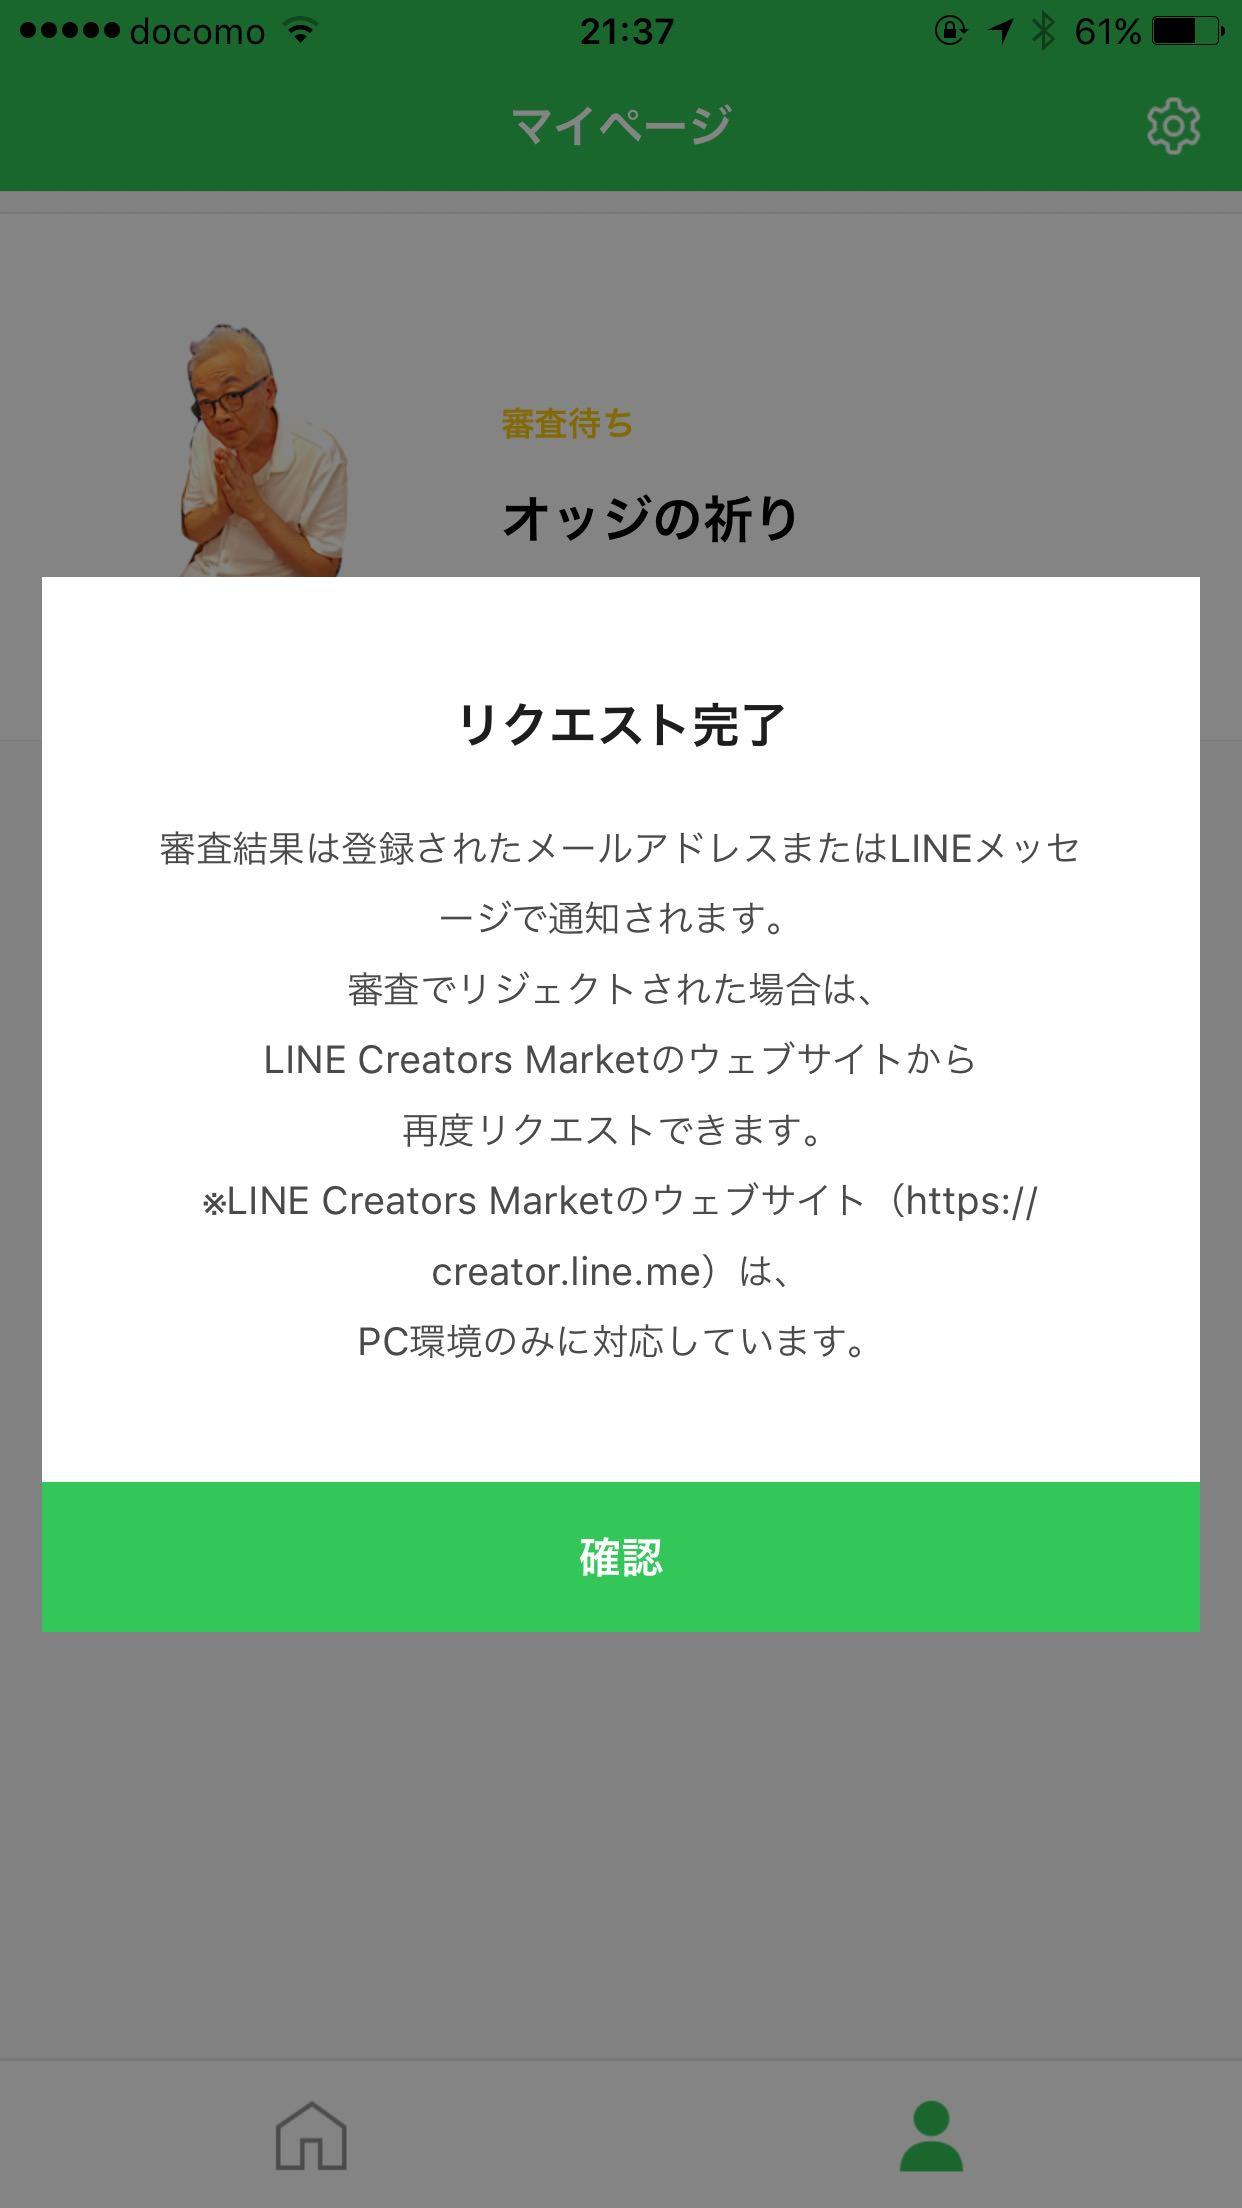 Line creators stamp 5371